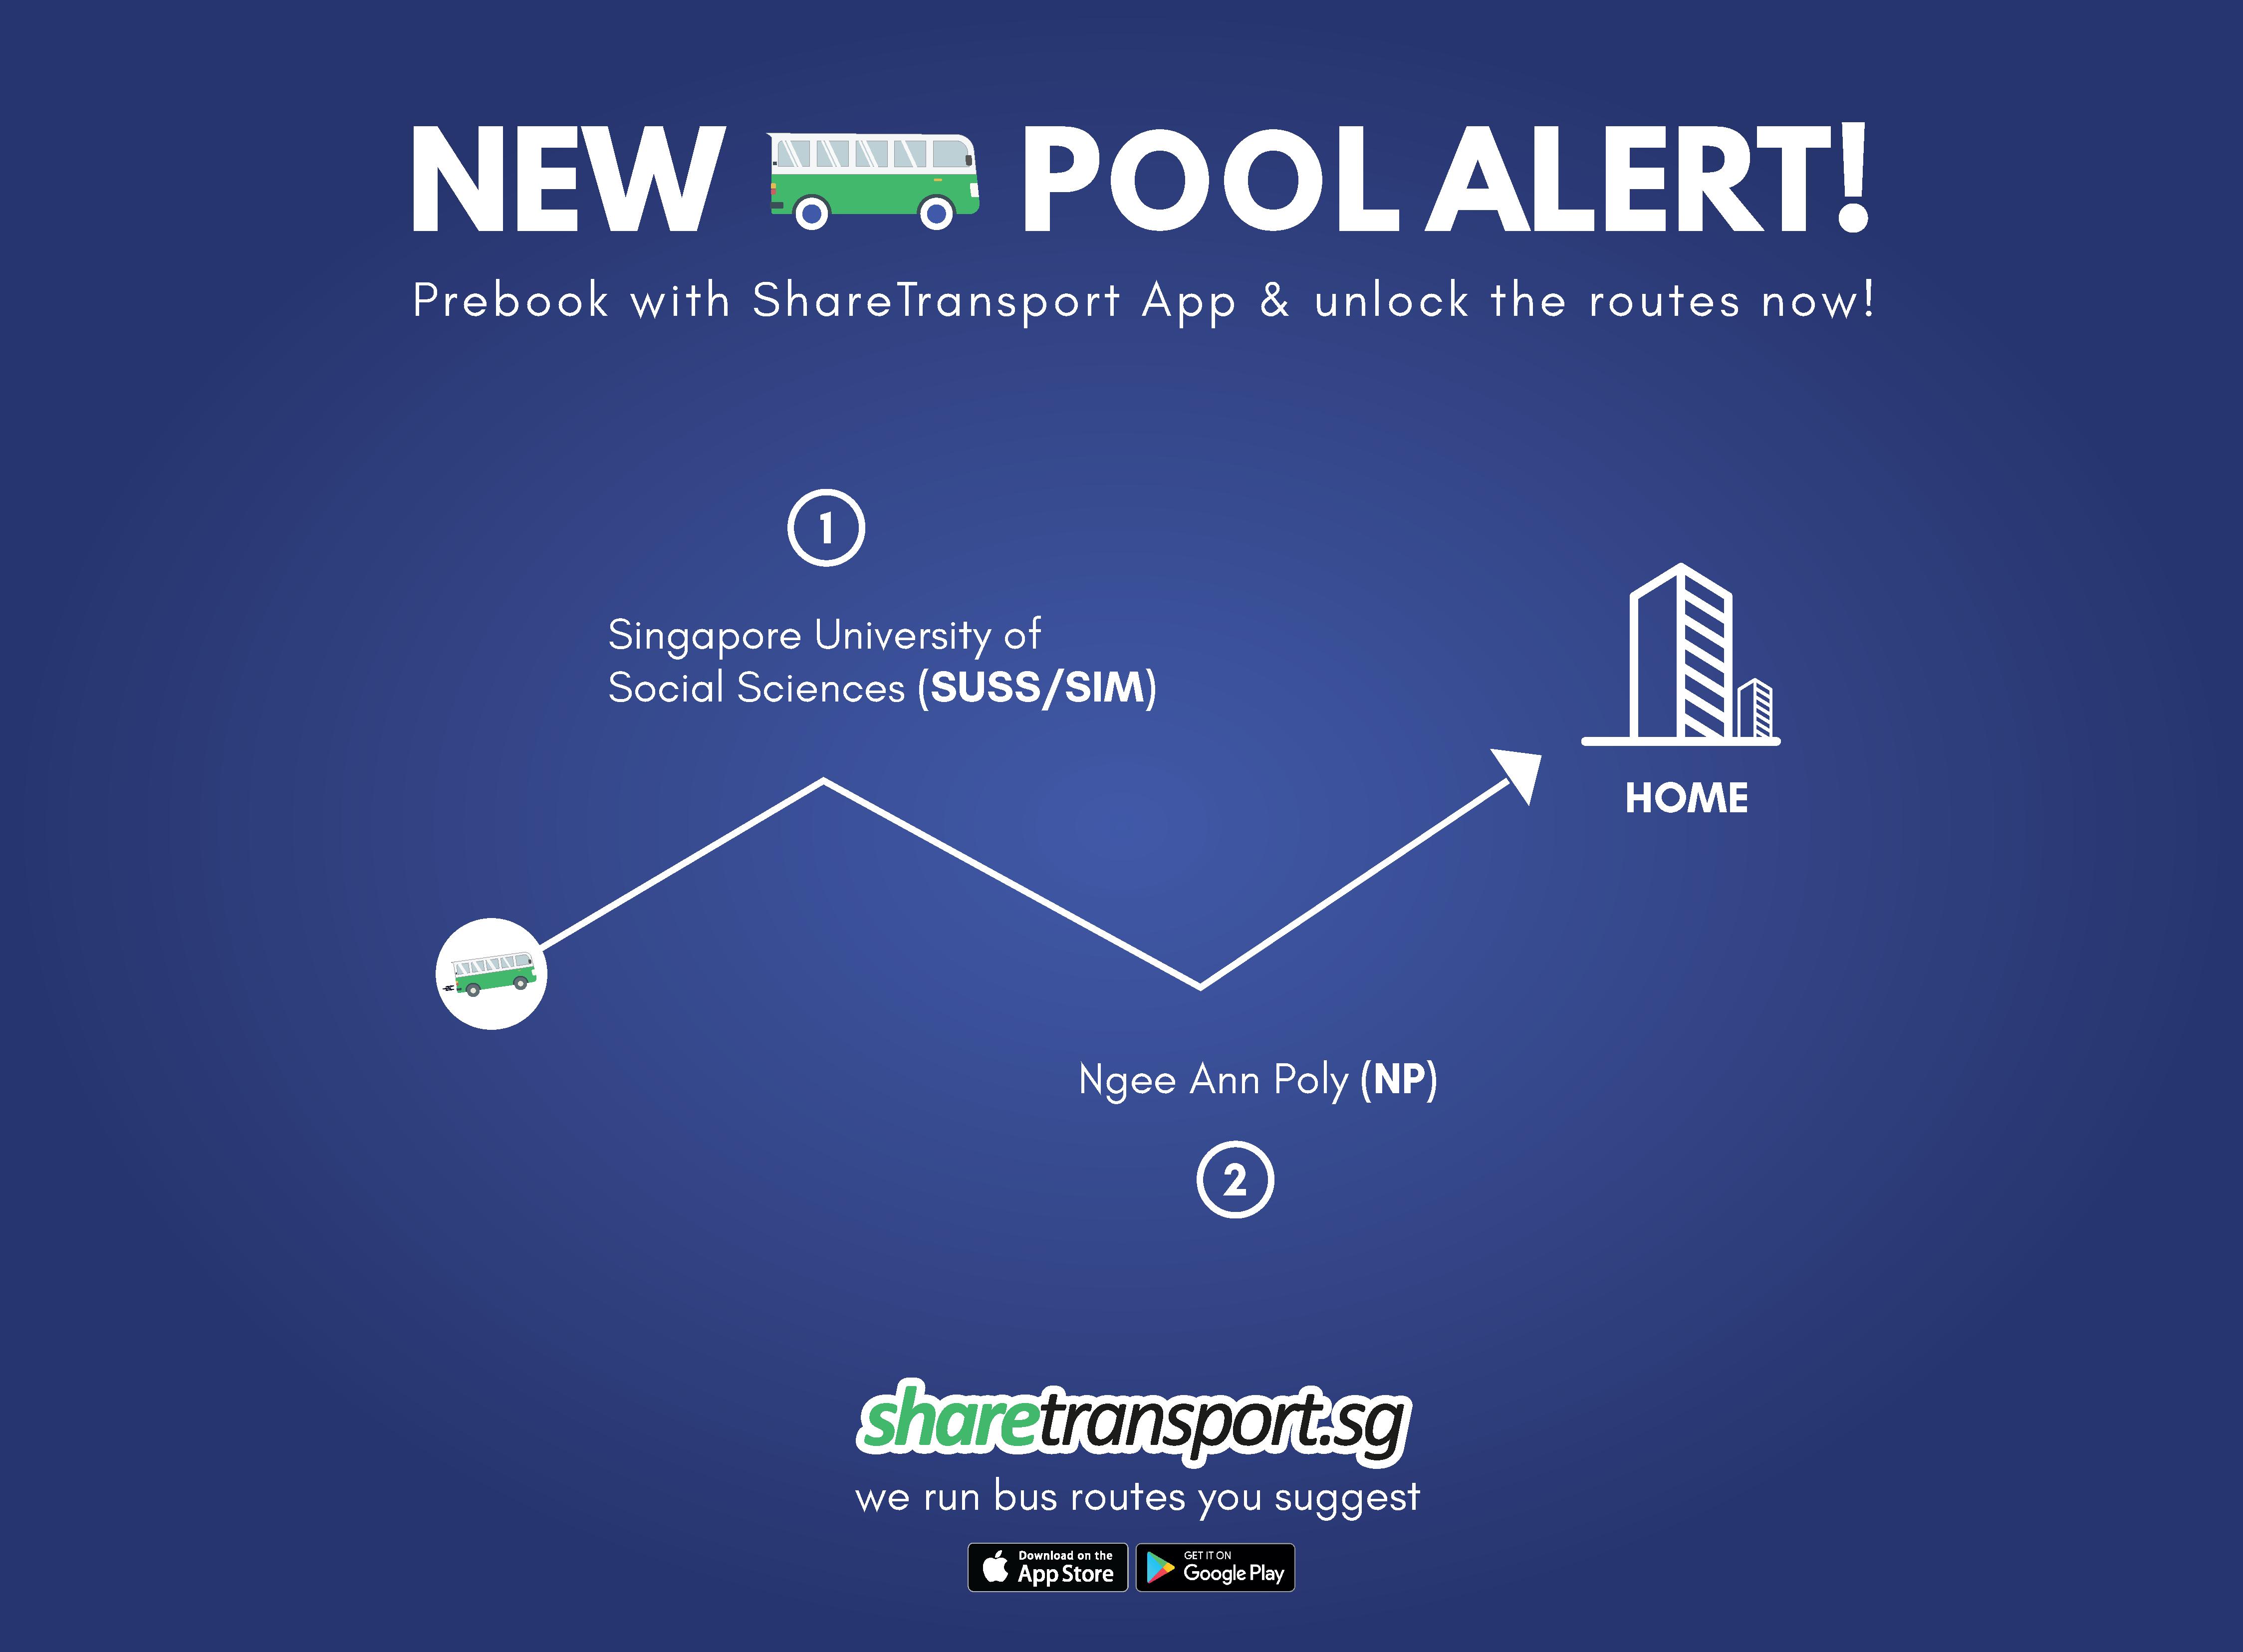 New Pool Alert